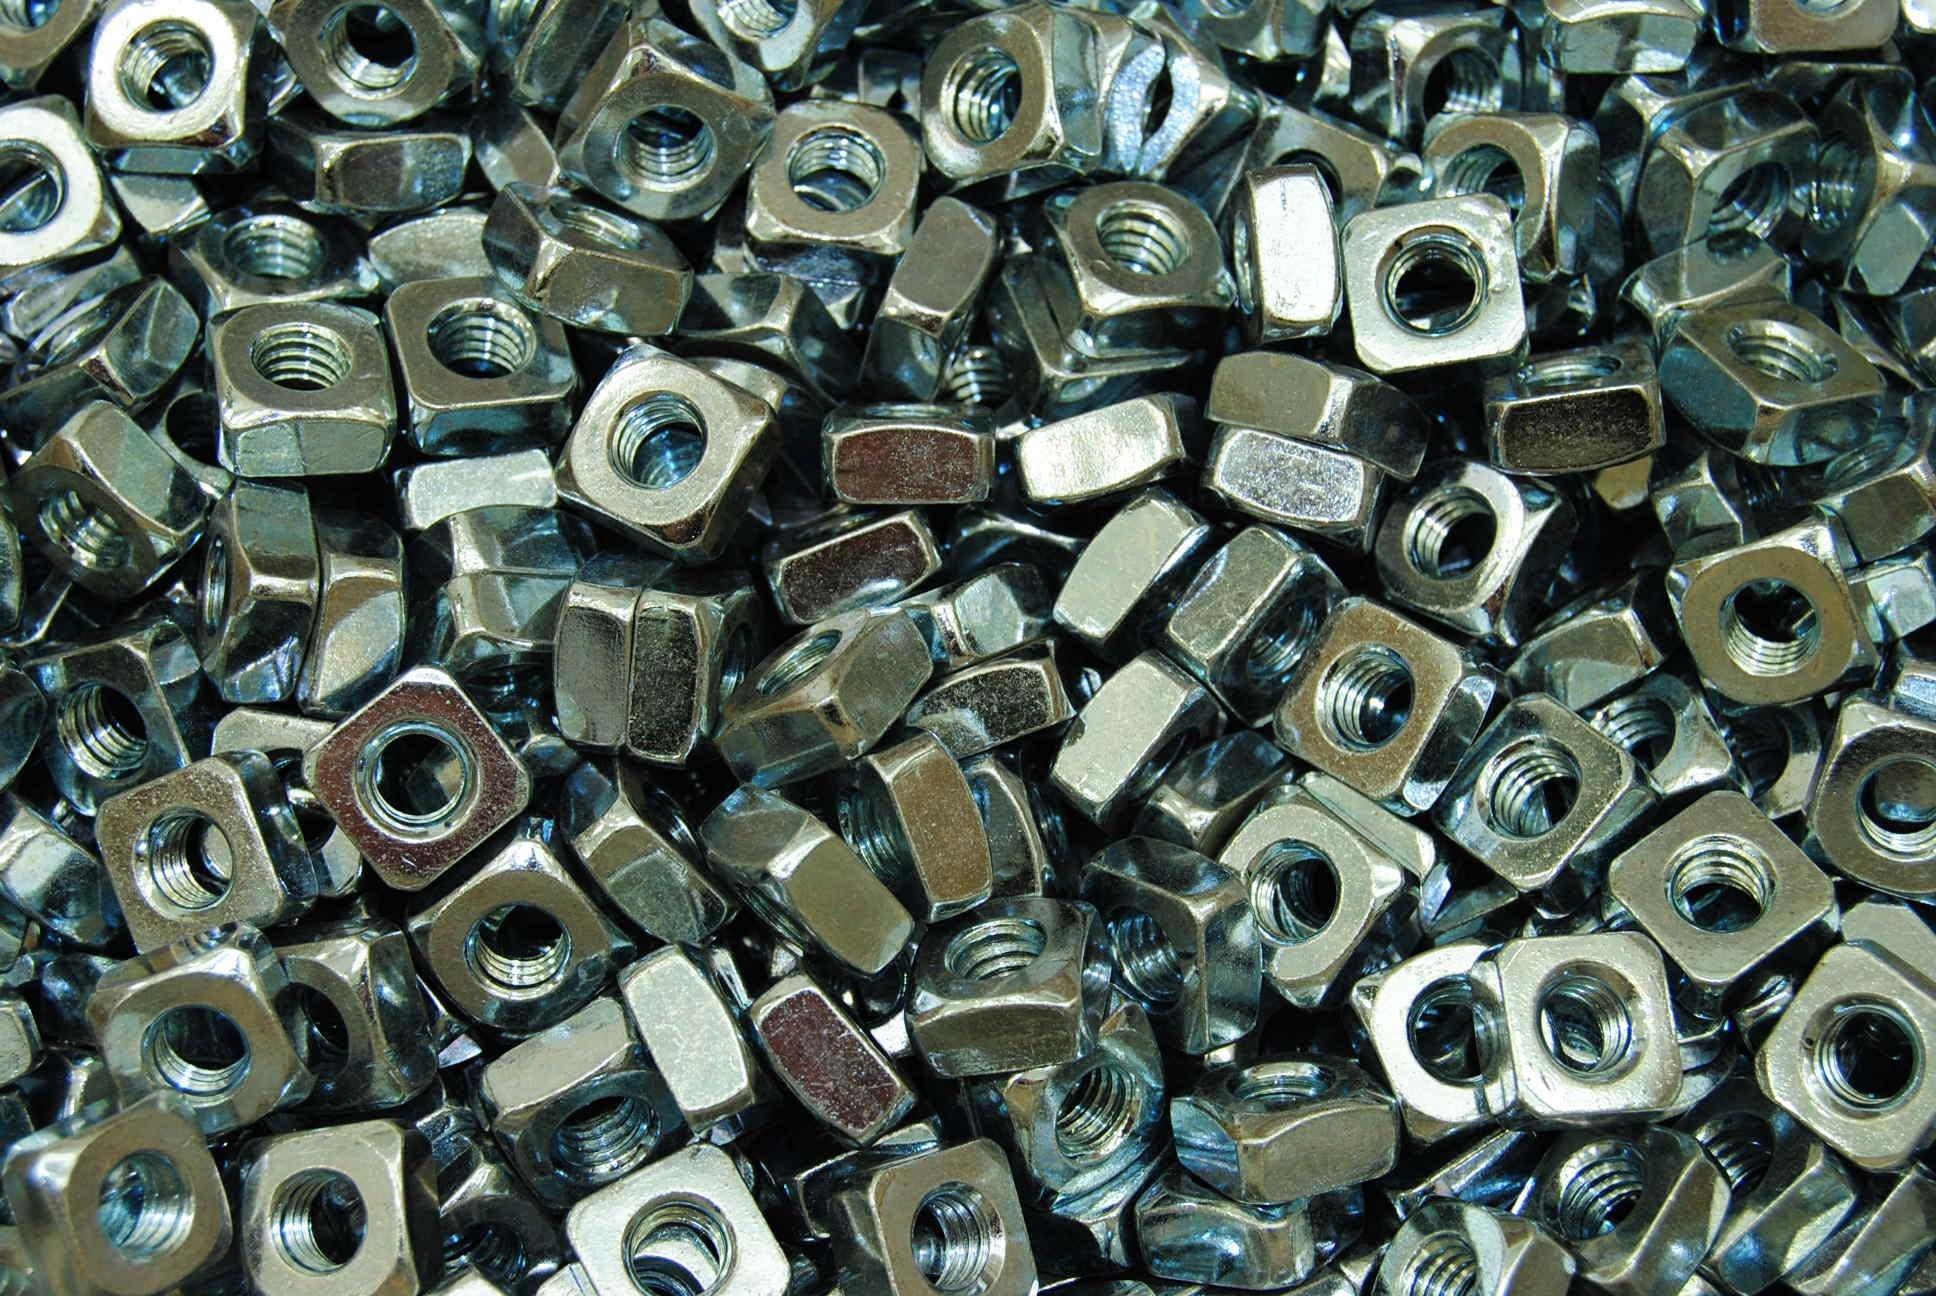 (350) Zinc Plated 5/16-18 Square Nut - Coarse Thread by Lexar Industrial